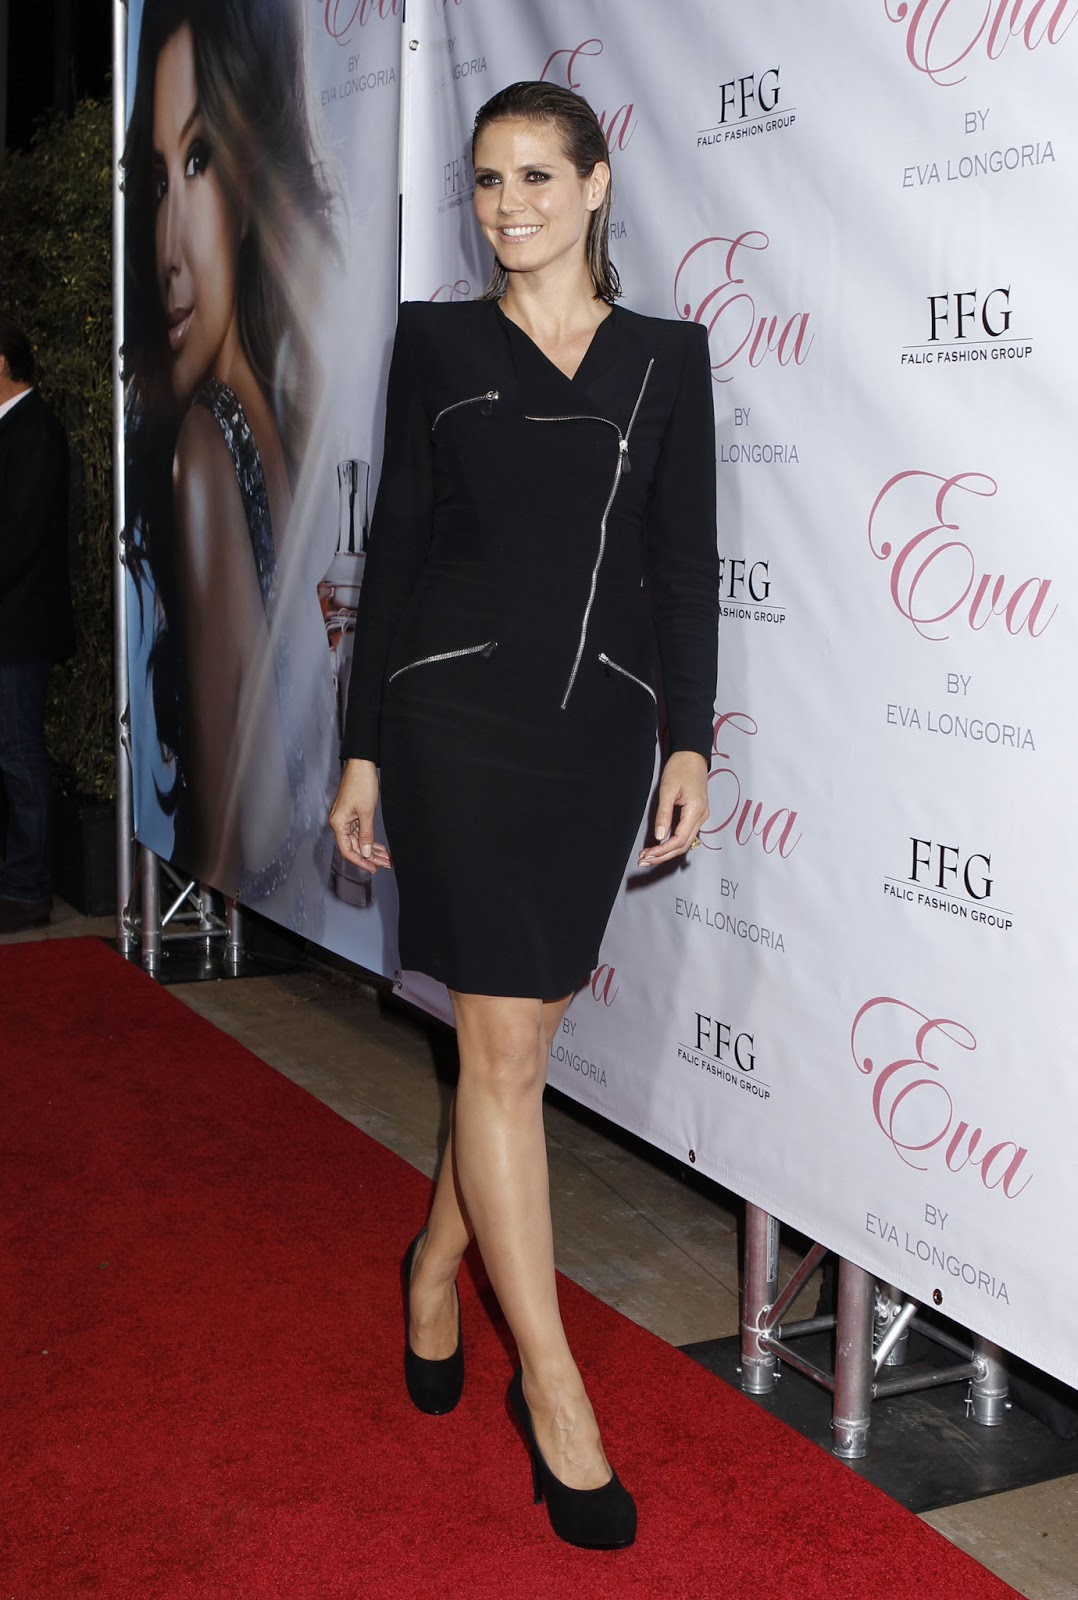 Heidi Klum Heidi Klum At Eva Longoria Parker Fragrance Launch In Hollywood 4 27 10